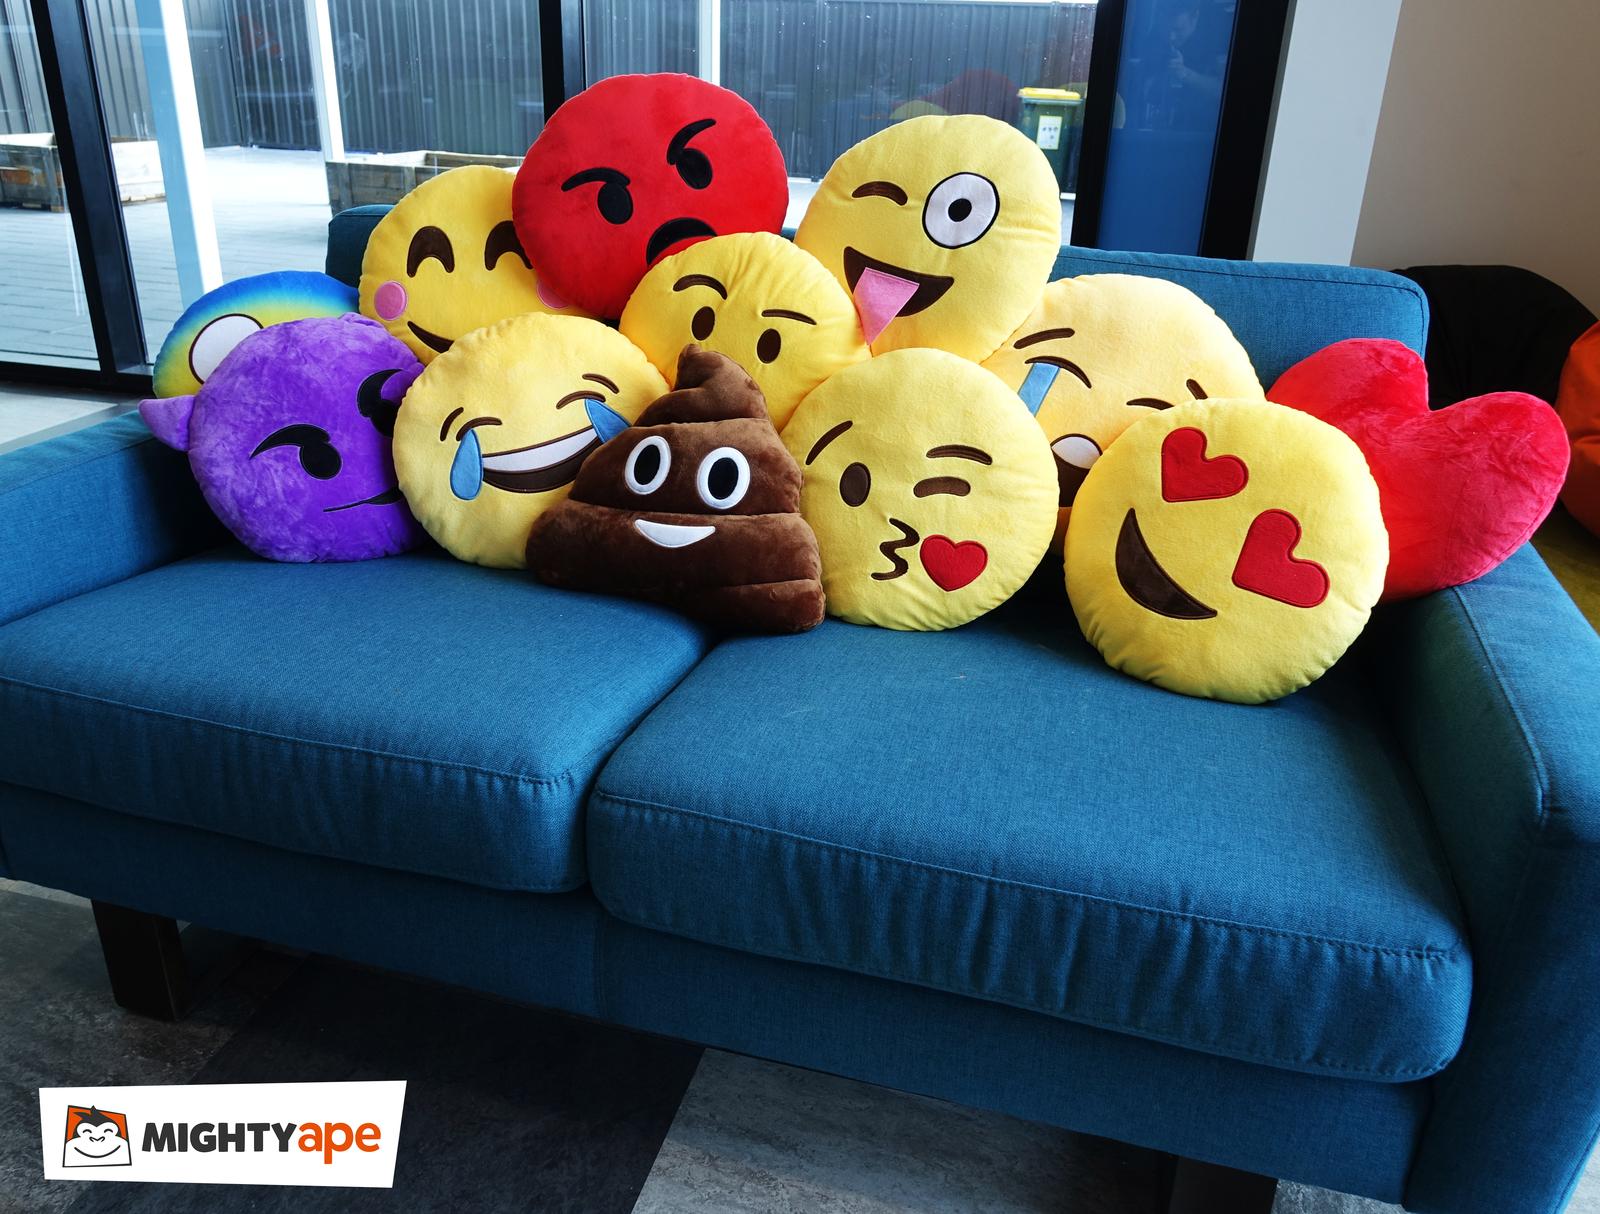 Smiling Face Emoji with Blushed Cheeks Cushion - 34cm image